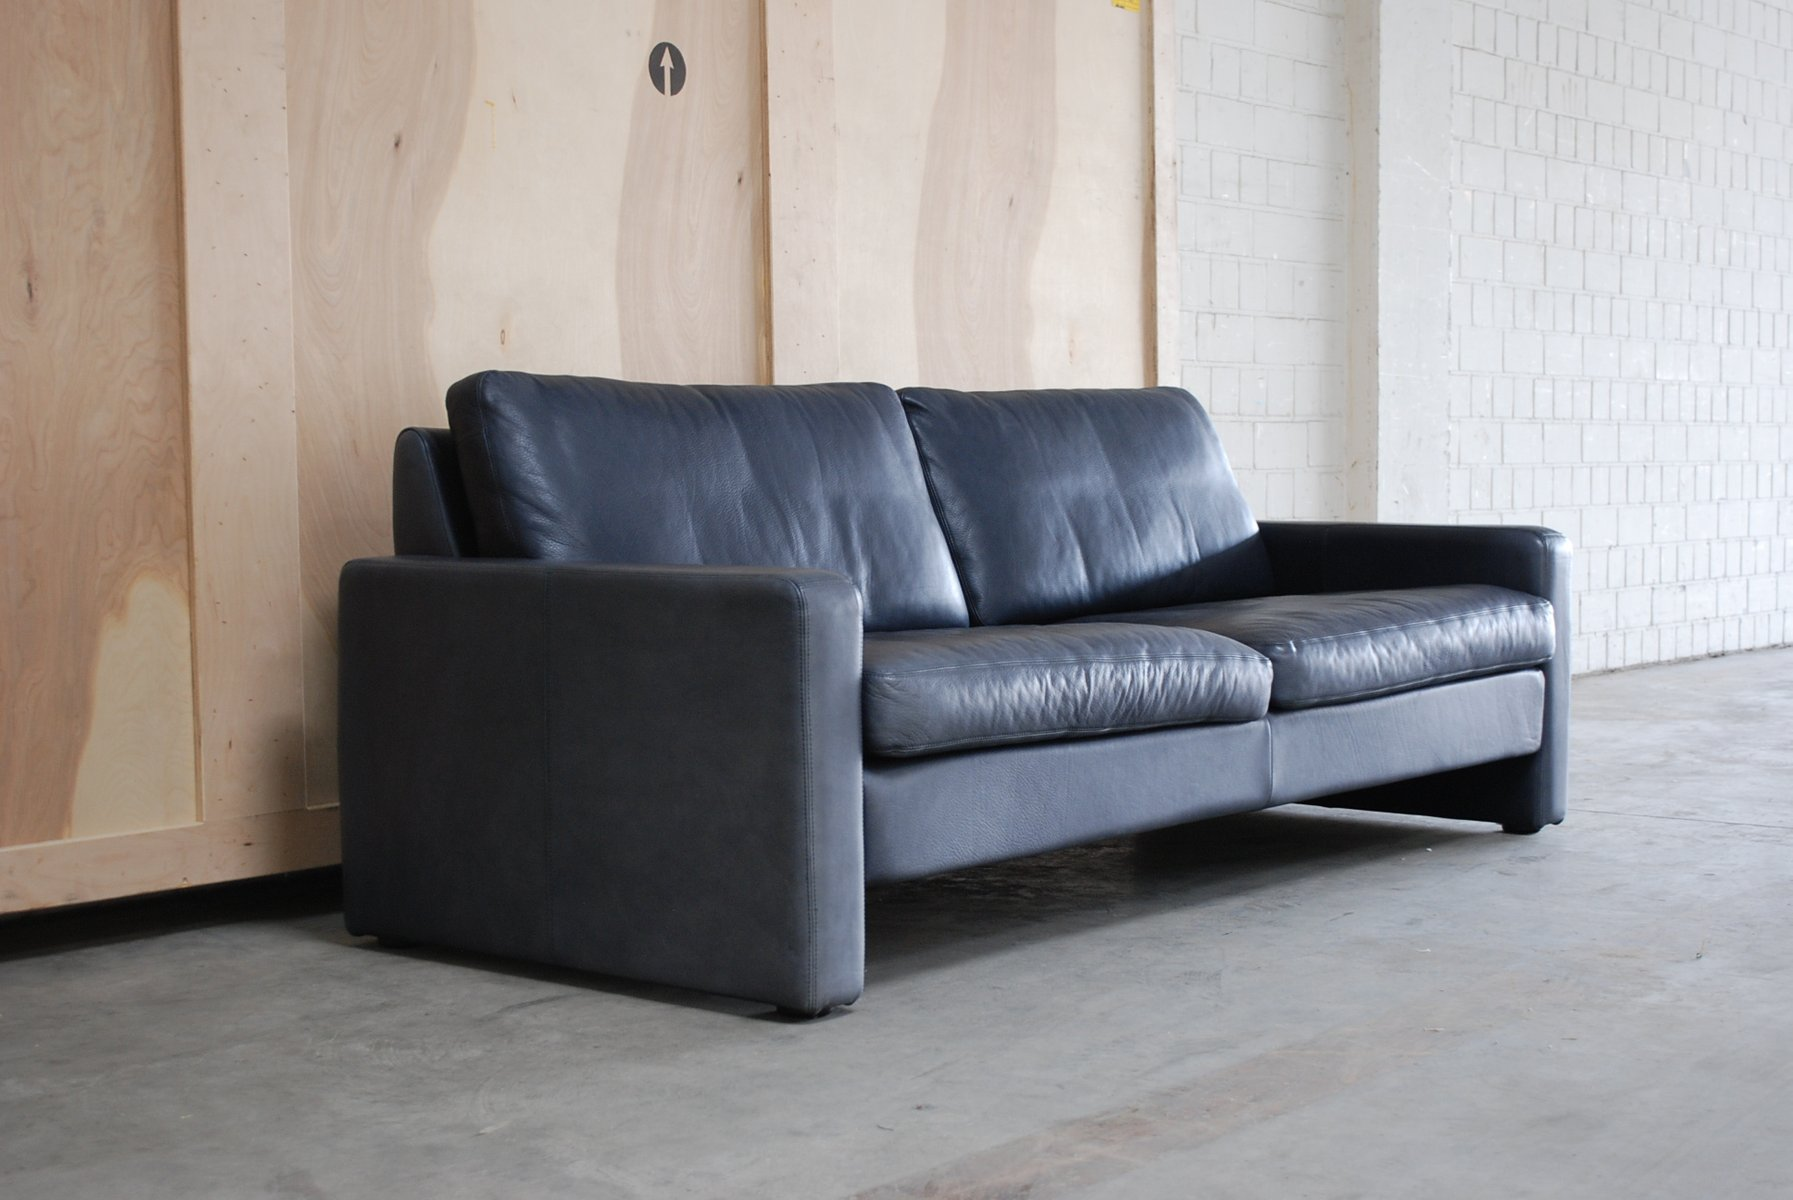 canap conseta vintage en cuir bleu de cor en vente sur pamono. Black Bedroom Furniture Sets. Home Design Ideas